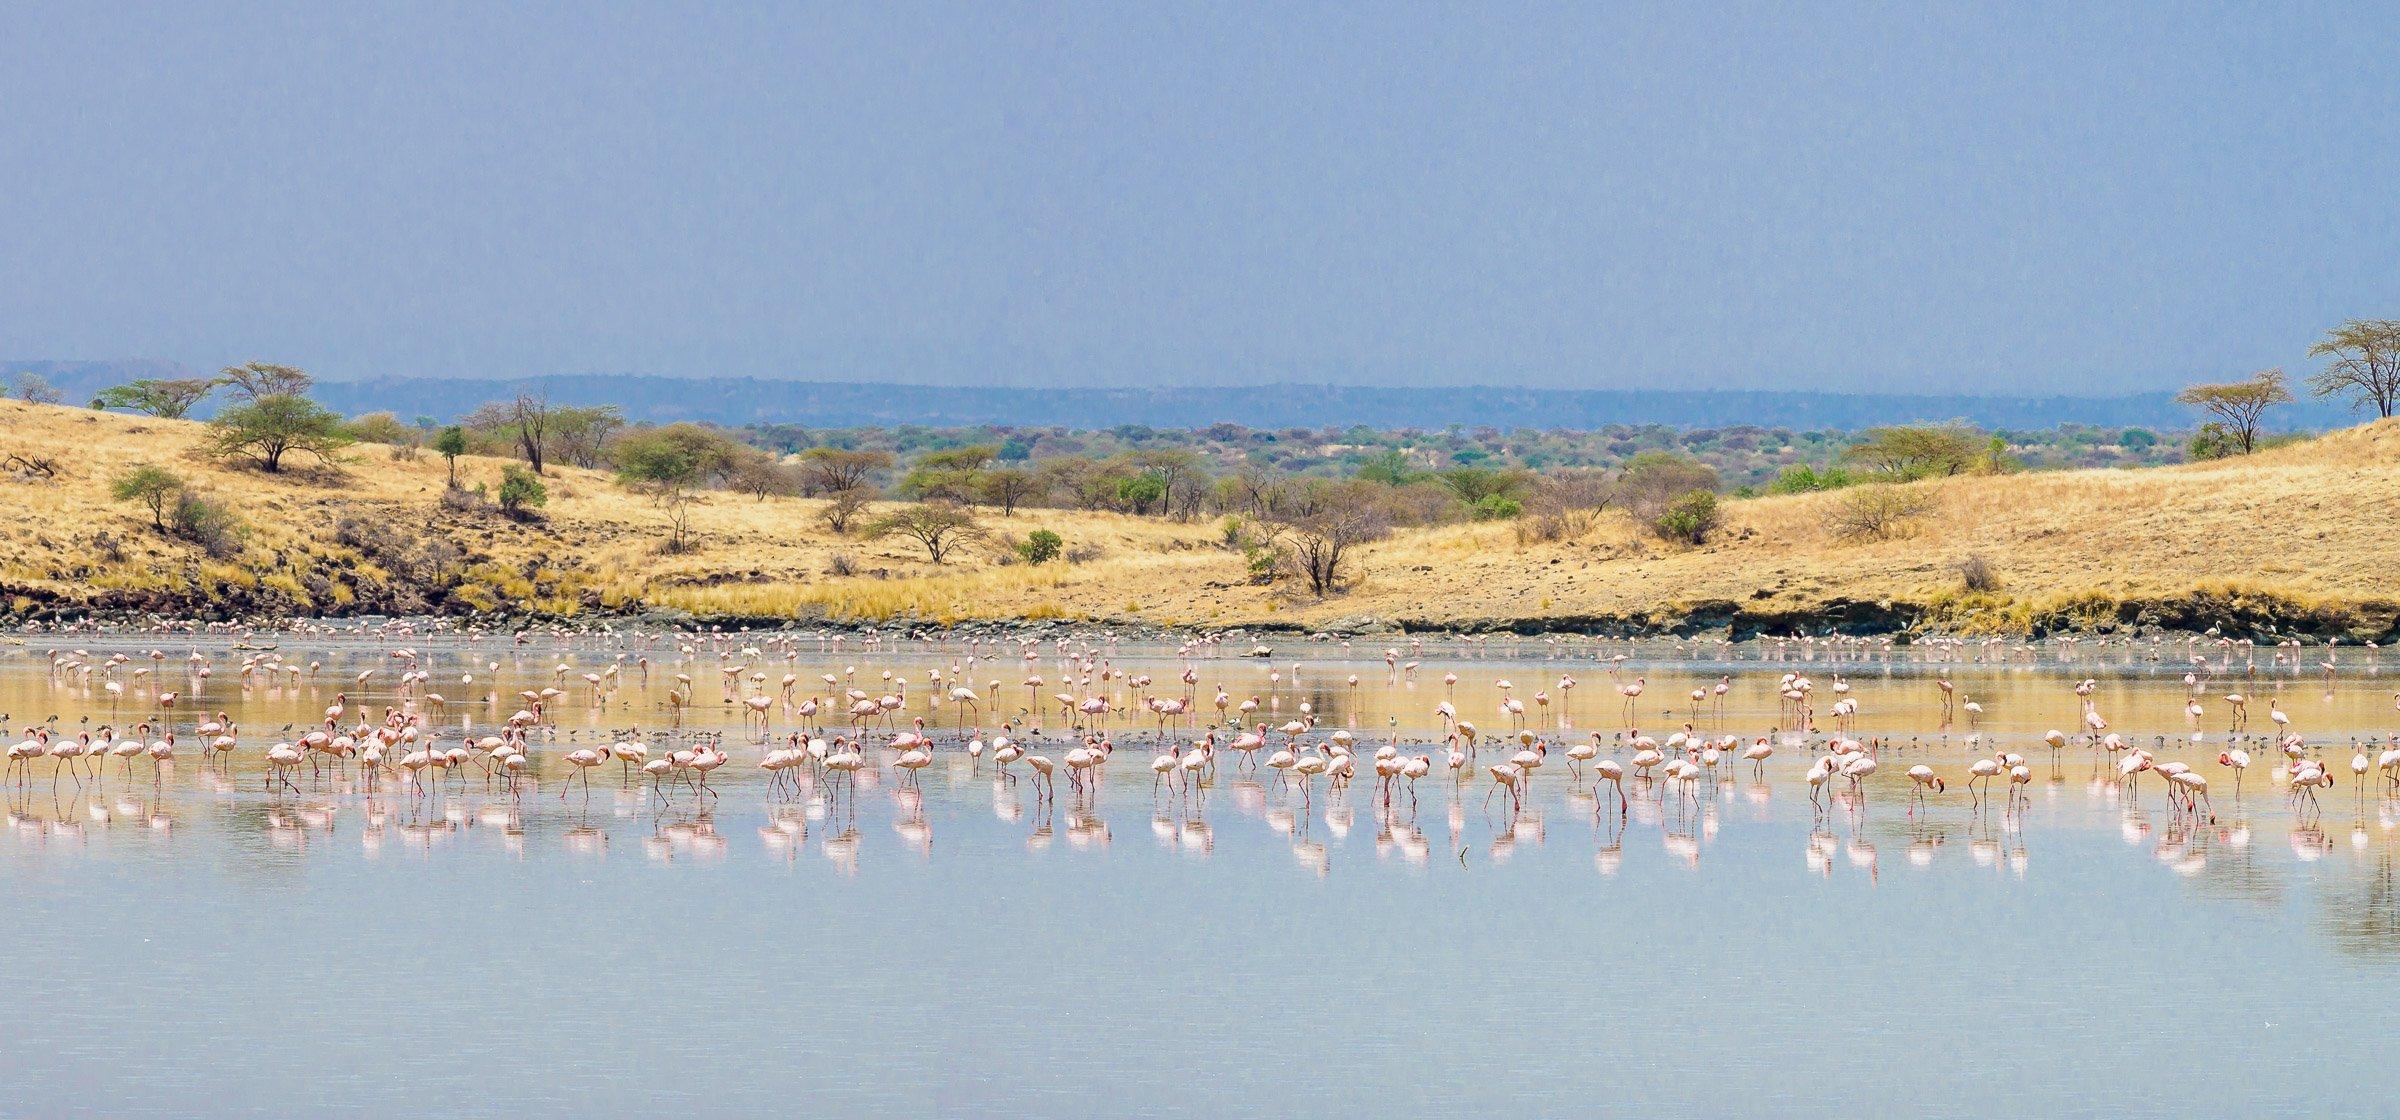 flamingoes reflected on a flooded plain near lake magadi